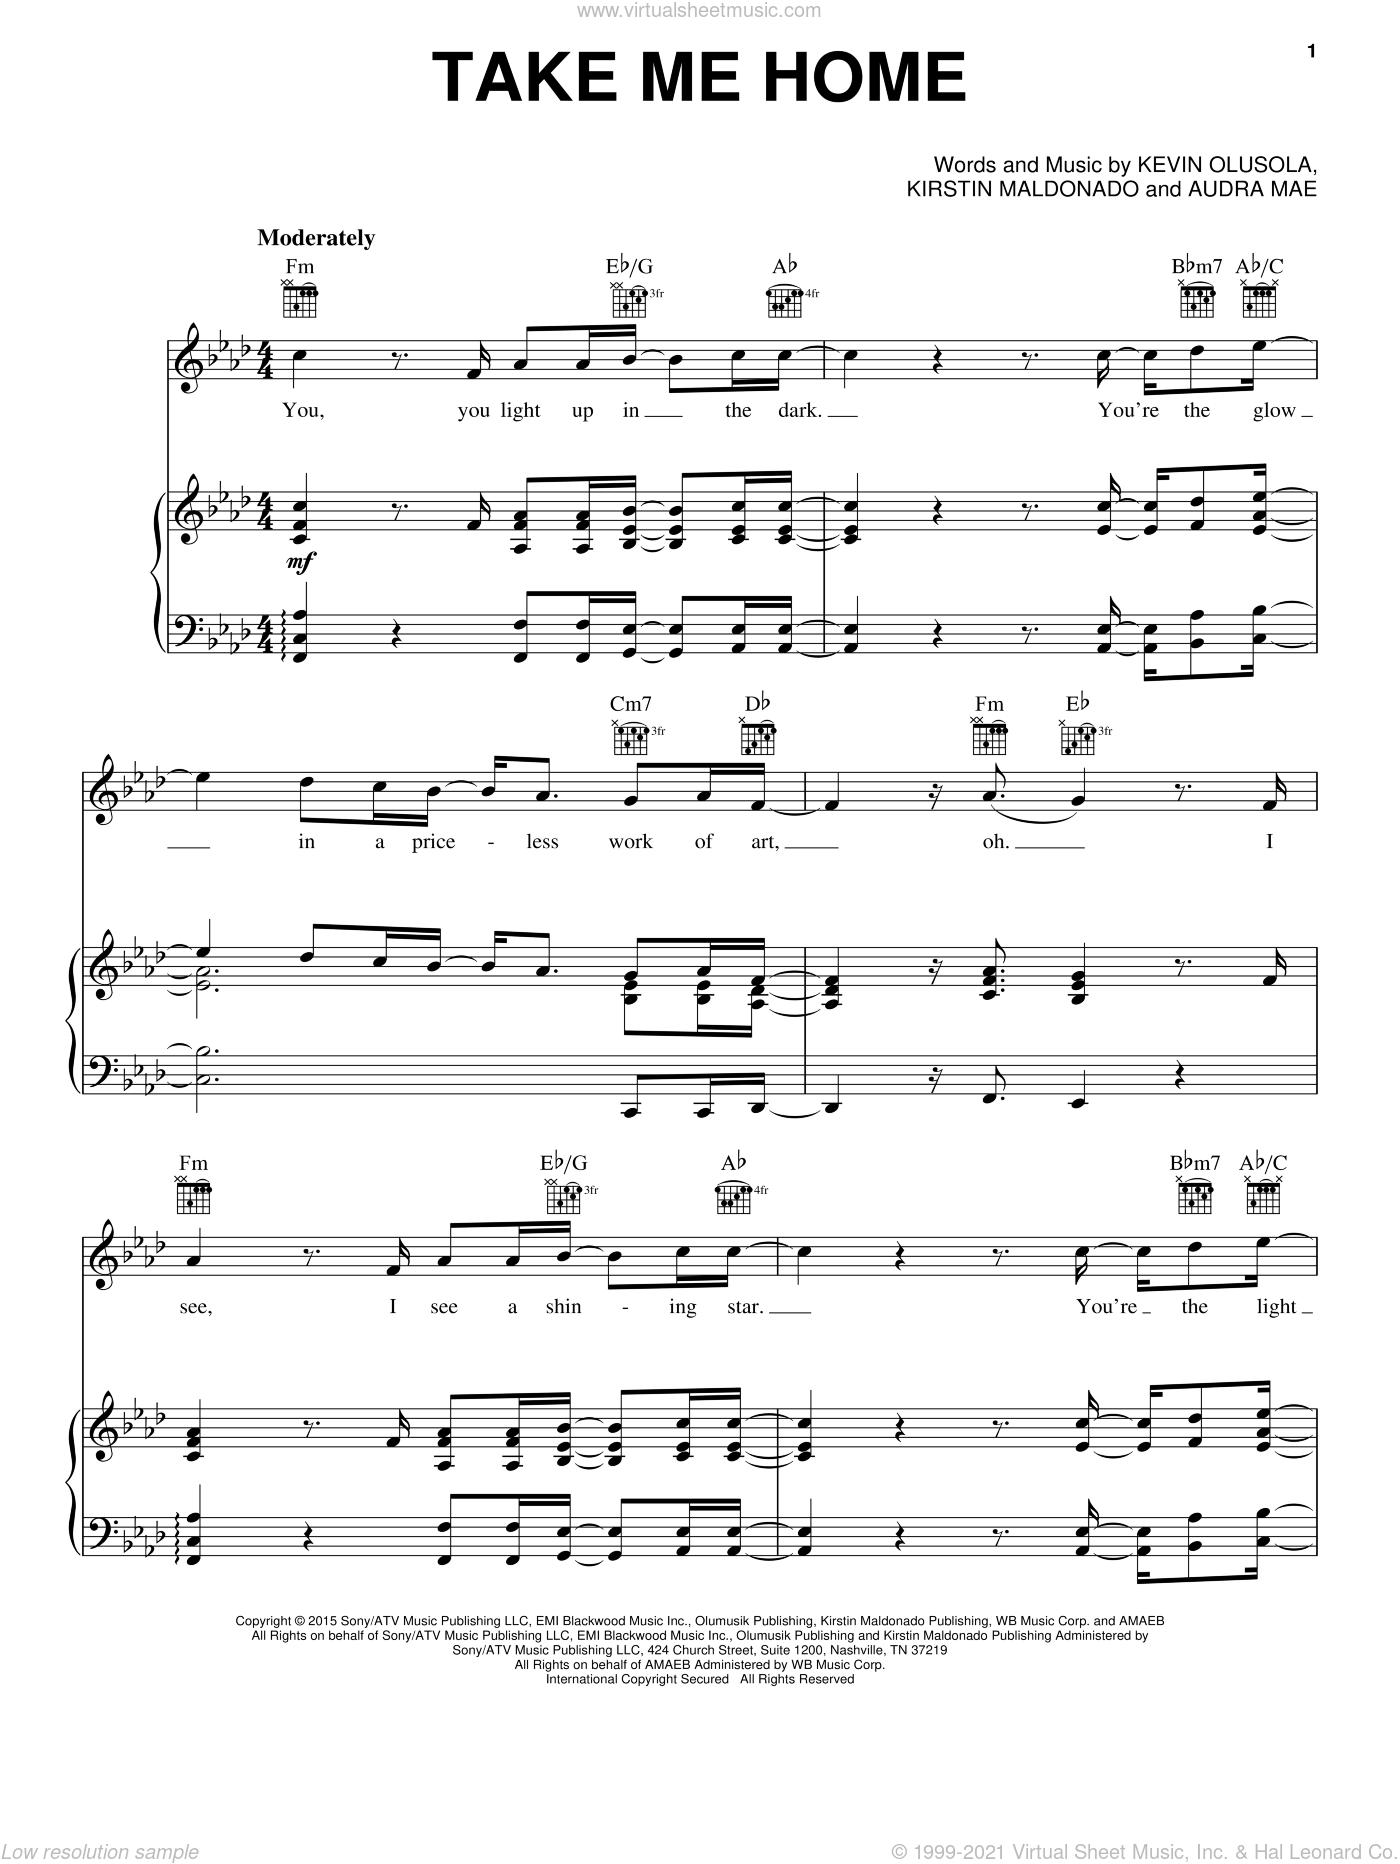 Take Me Home sheet music for voice, piano or guitar by Pentatonix, Audra Mae, Kevin Olusola and Kirstin Maldonado, intermediate skill level